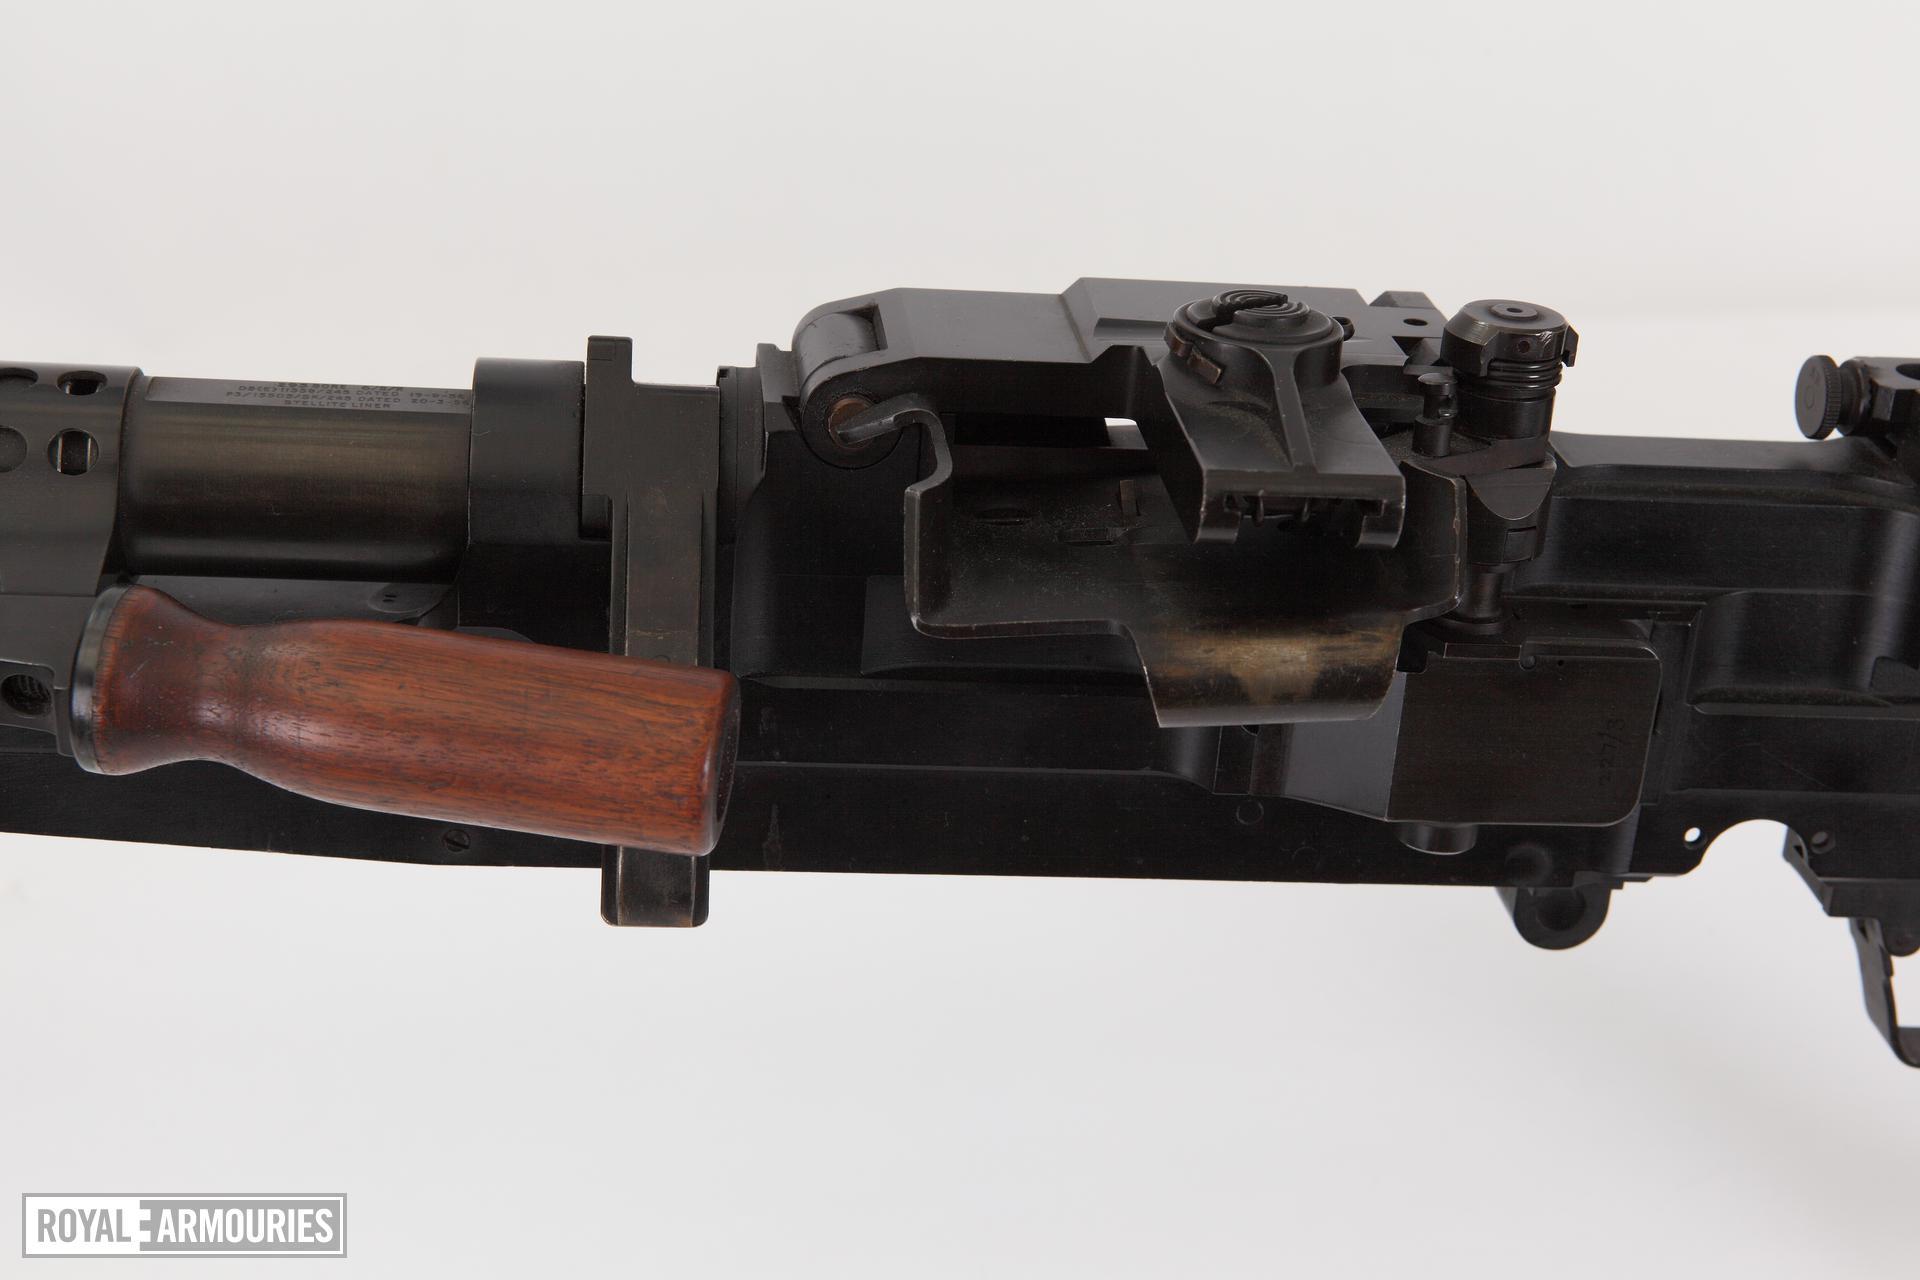 Centrefire automatic machine gun - SFMG Experimental Turpin Prototype